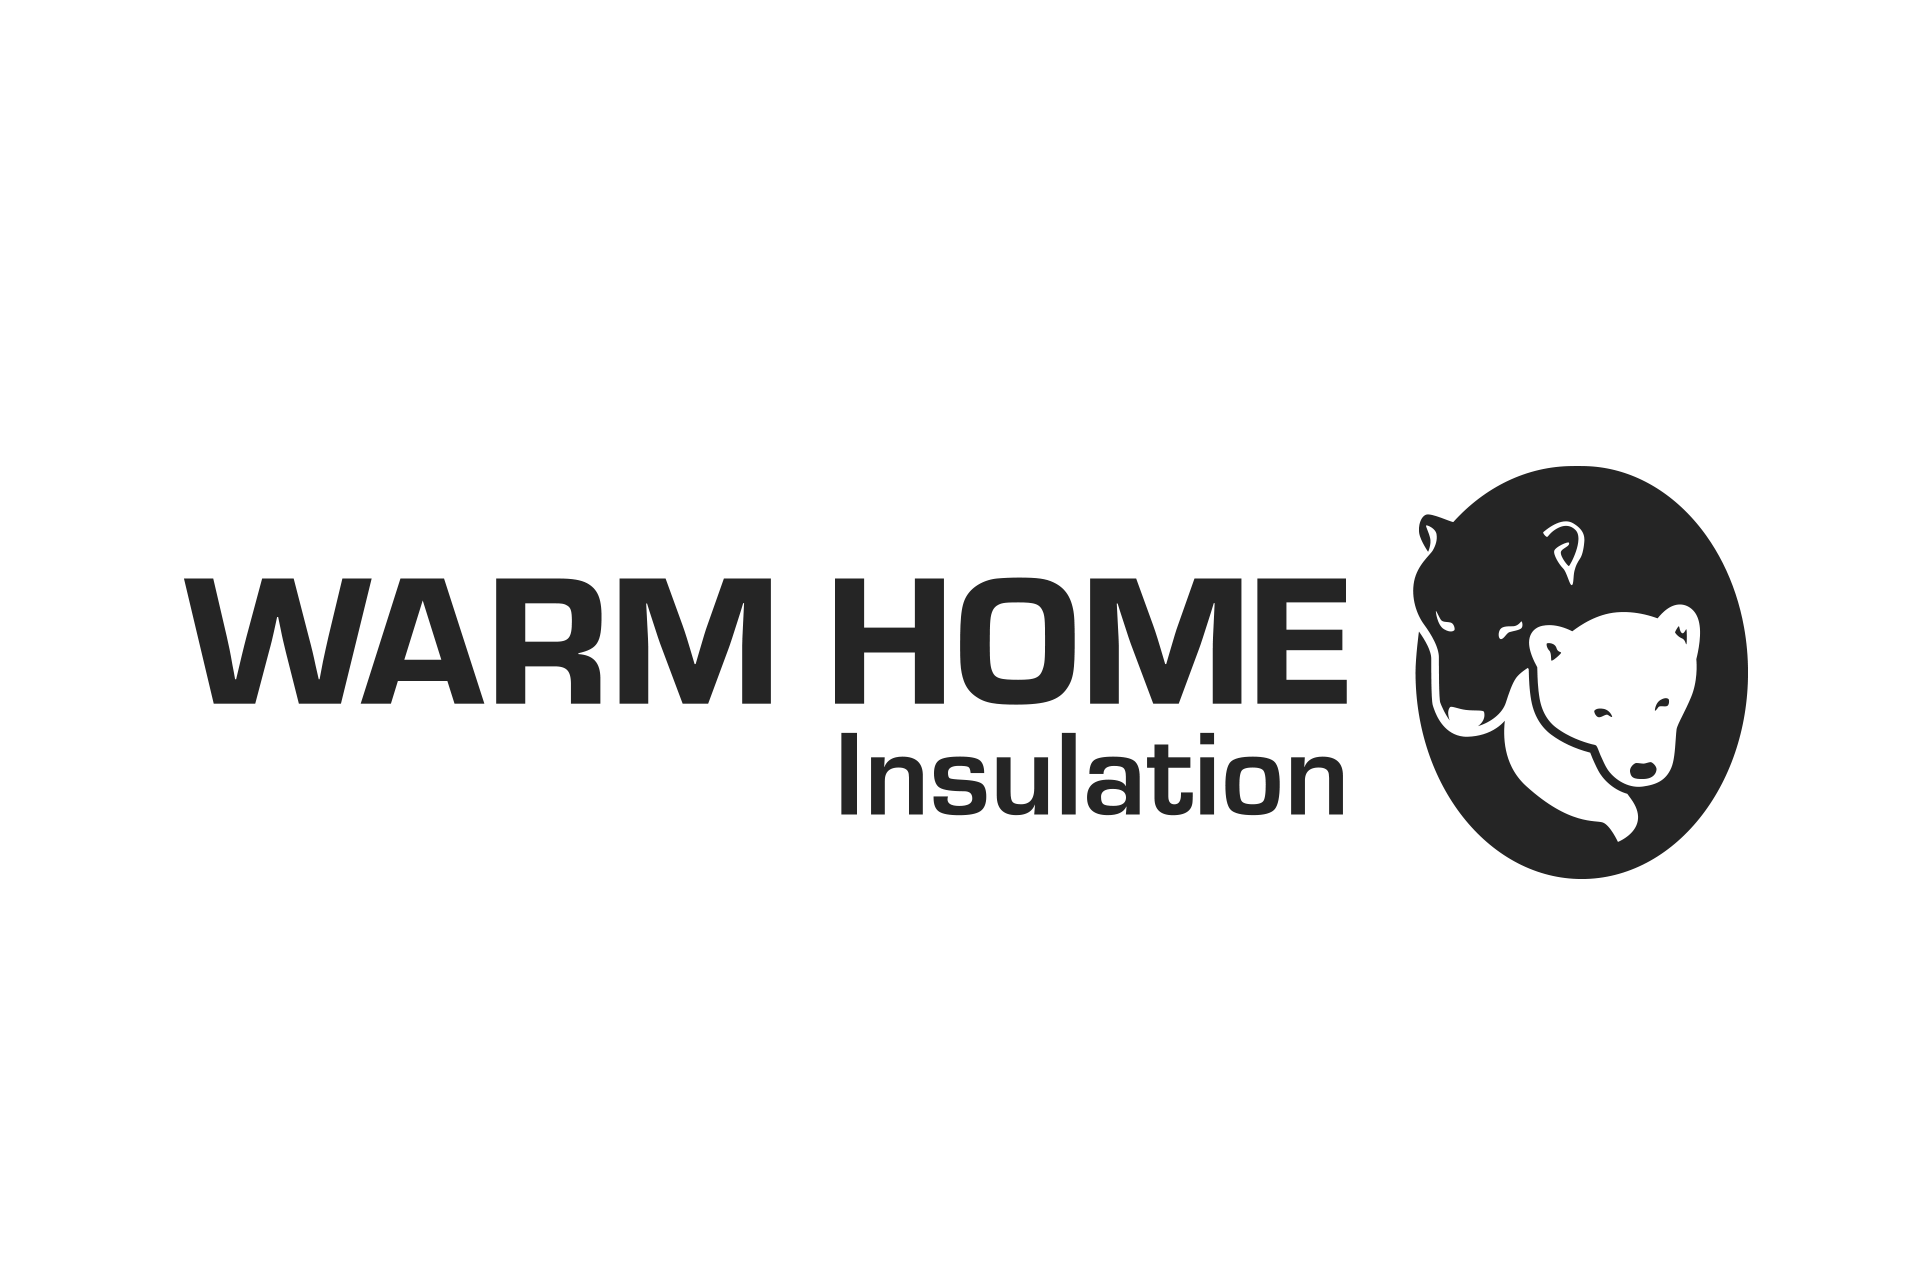 Warm Home Insulation